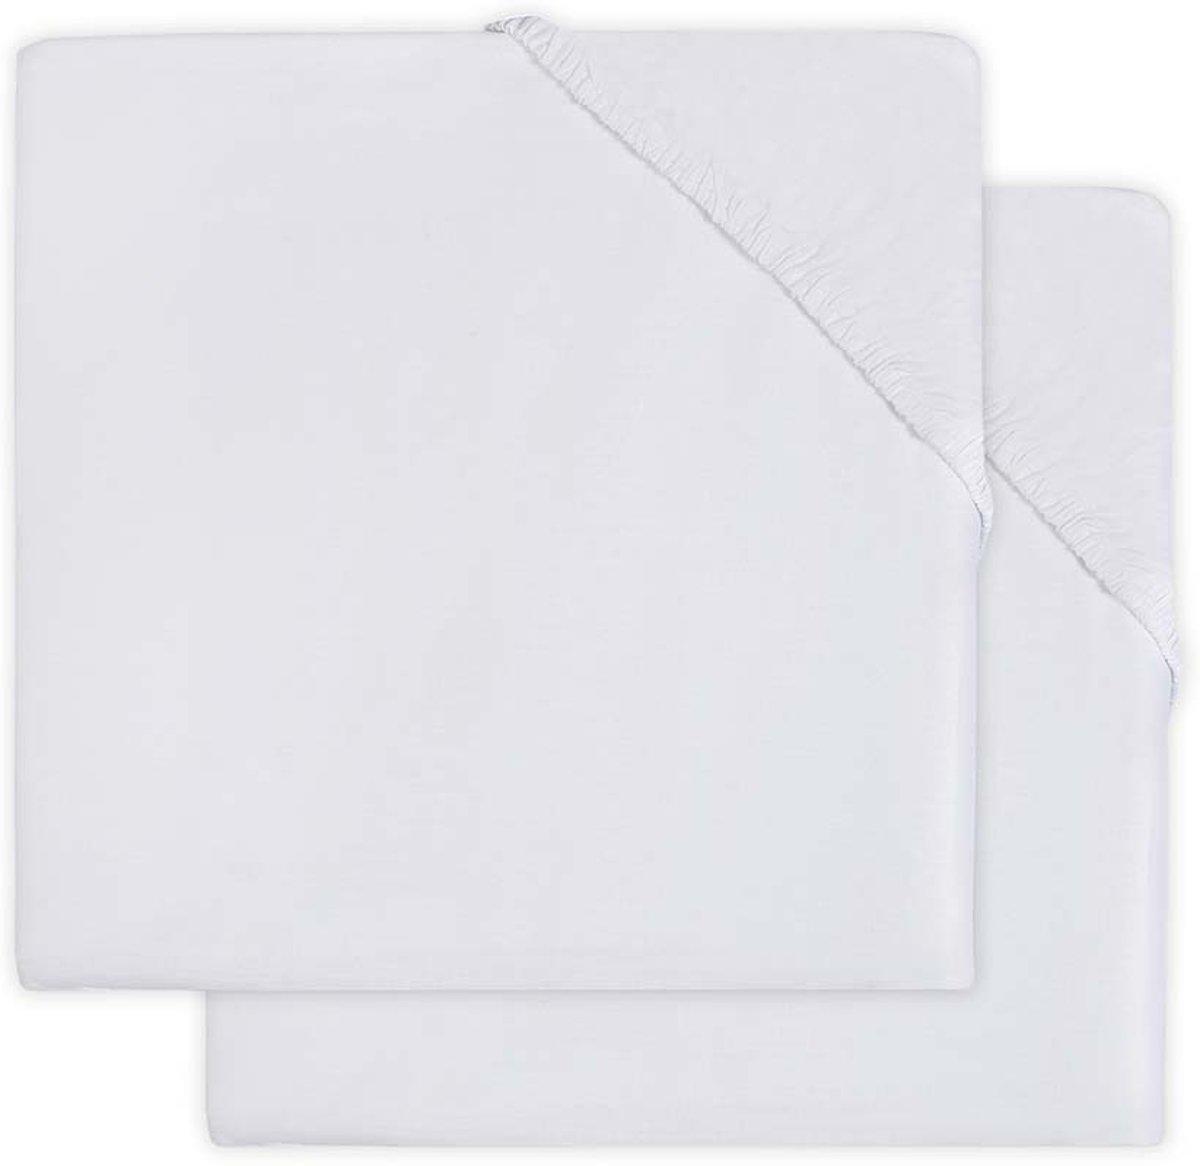 Jollein Hoeslaken jersey boxmatras  75x95cm white (2pack)